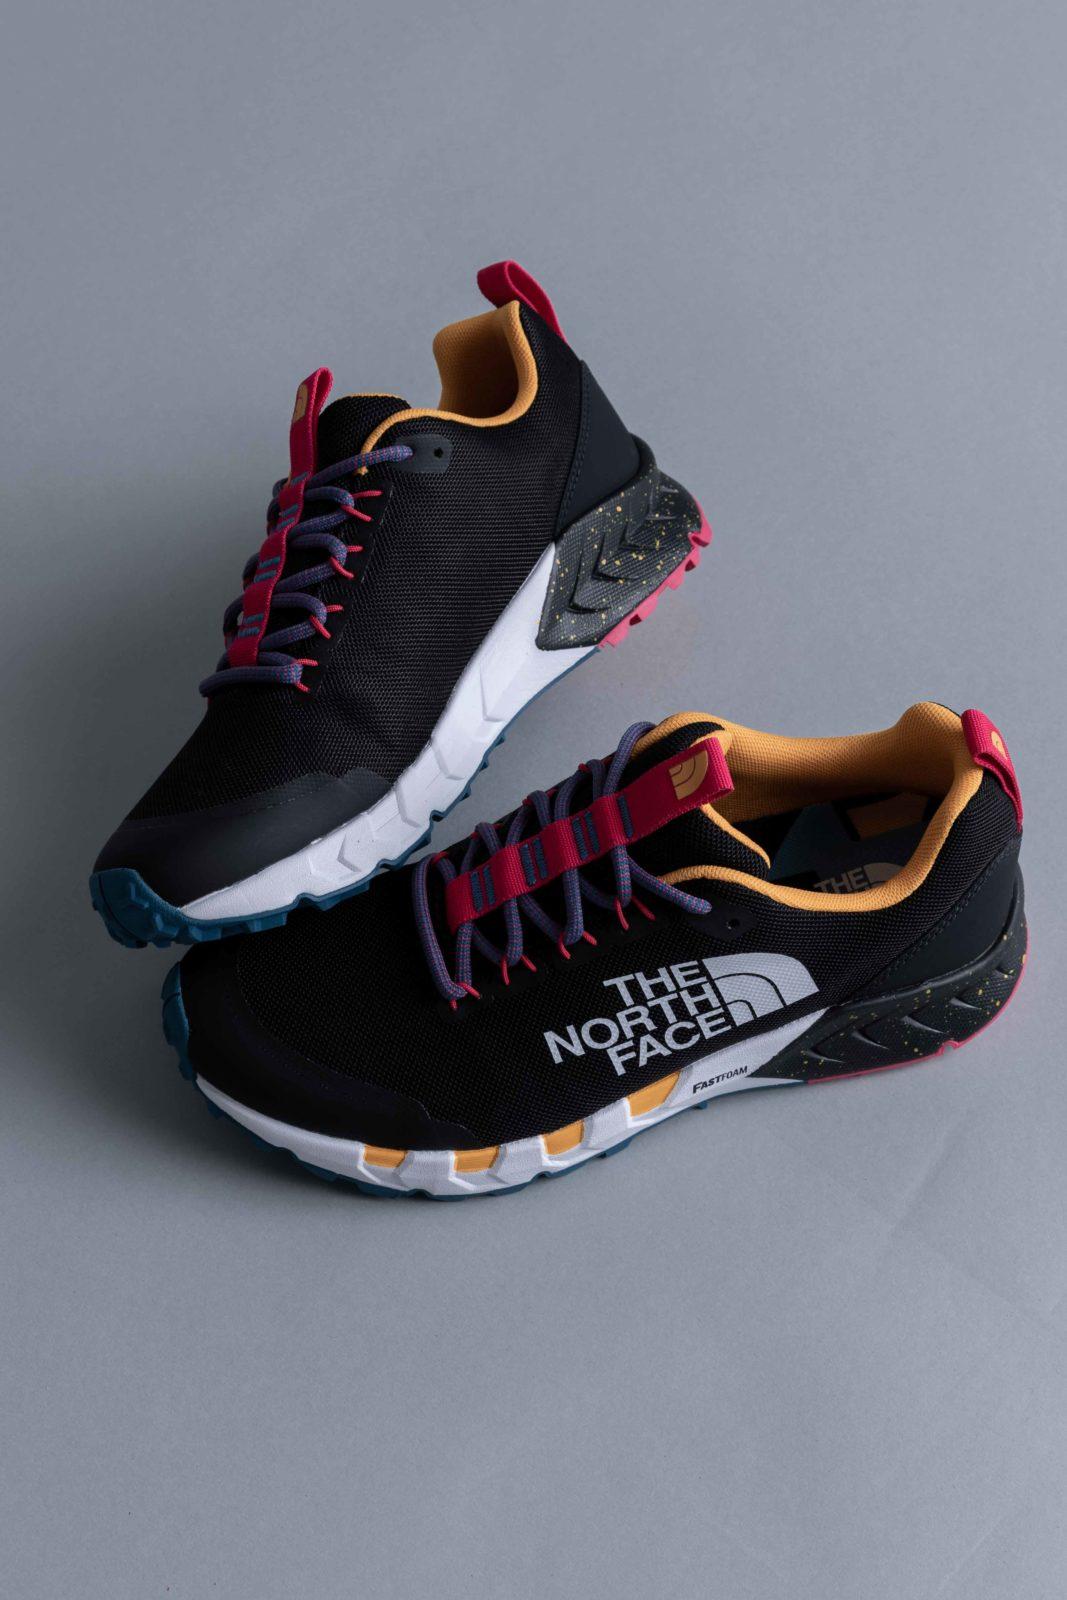 North Face Spreva Pop Sneakers Black